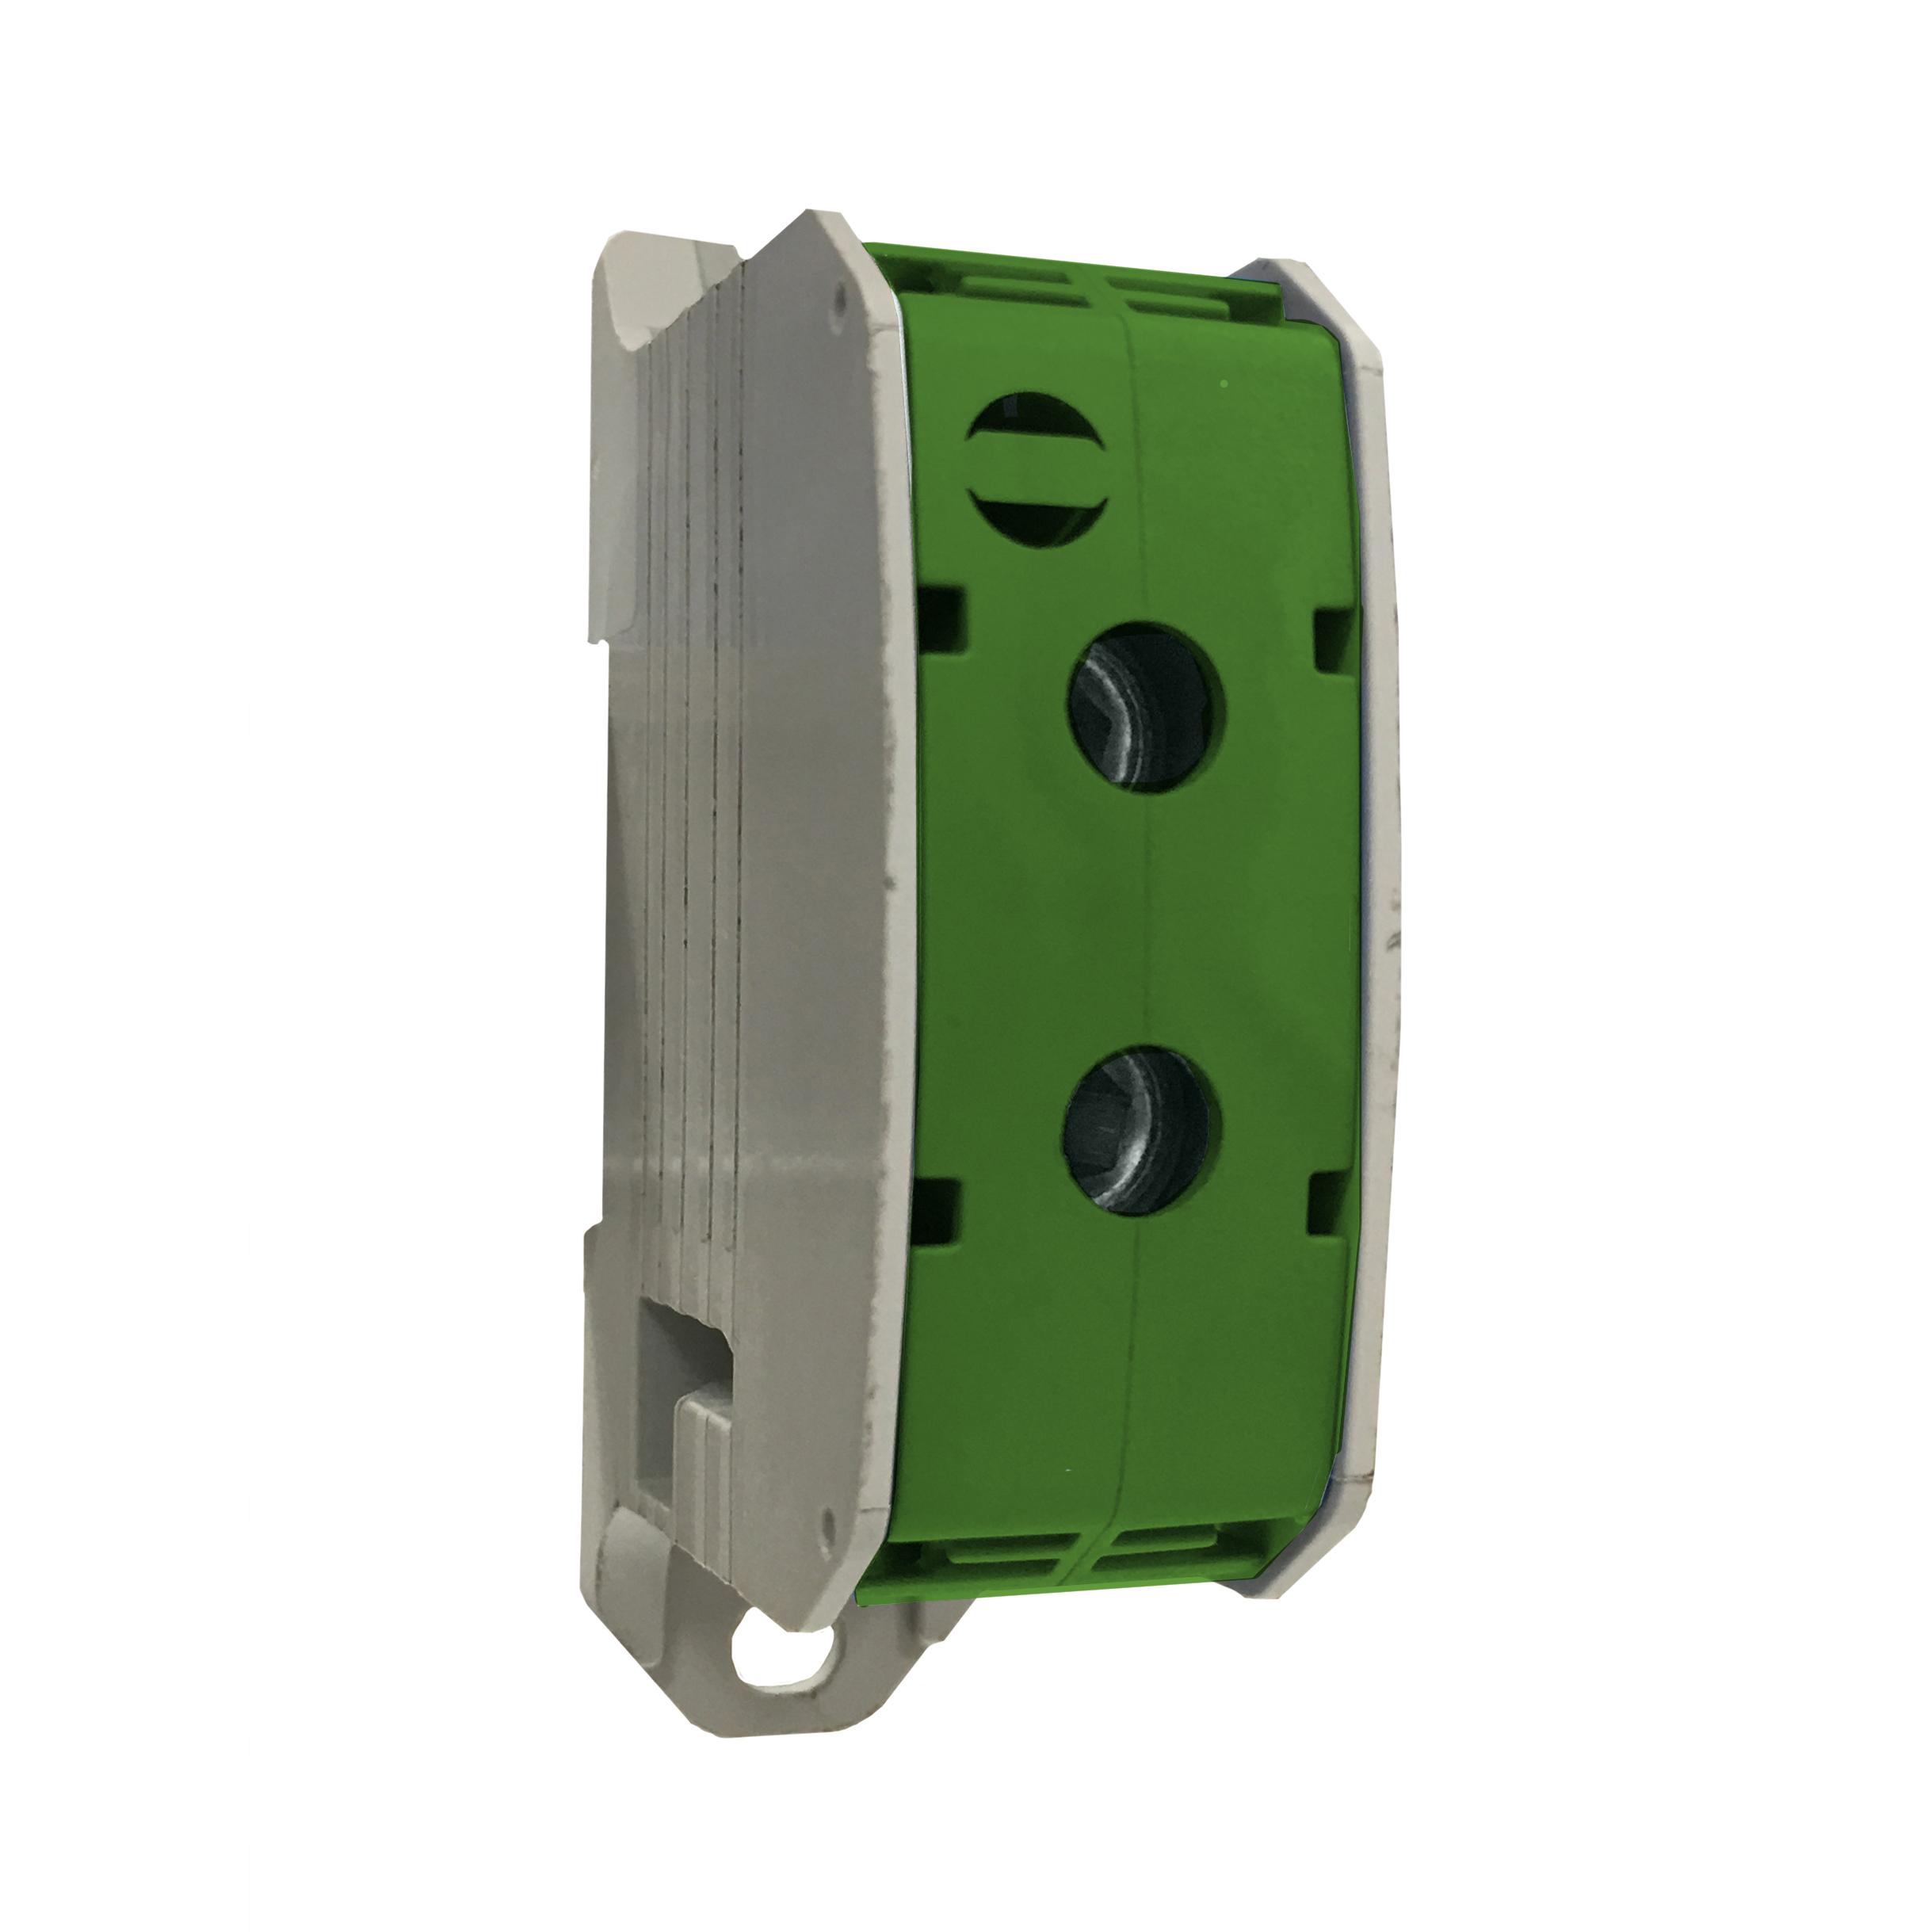 1 Stk Aluminium /Kupfer Klemme, 1-polig, 95mm² grün IKA21430--